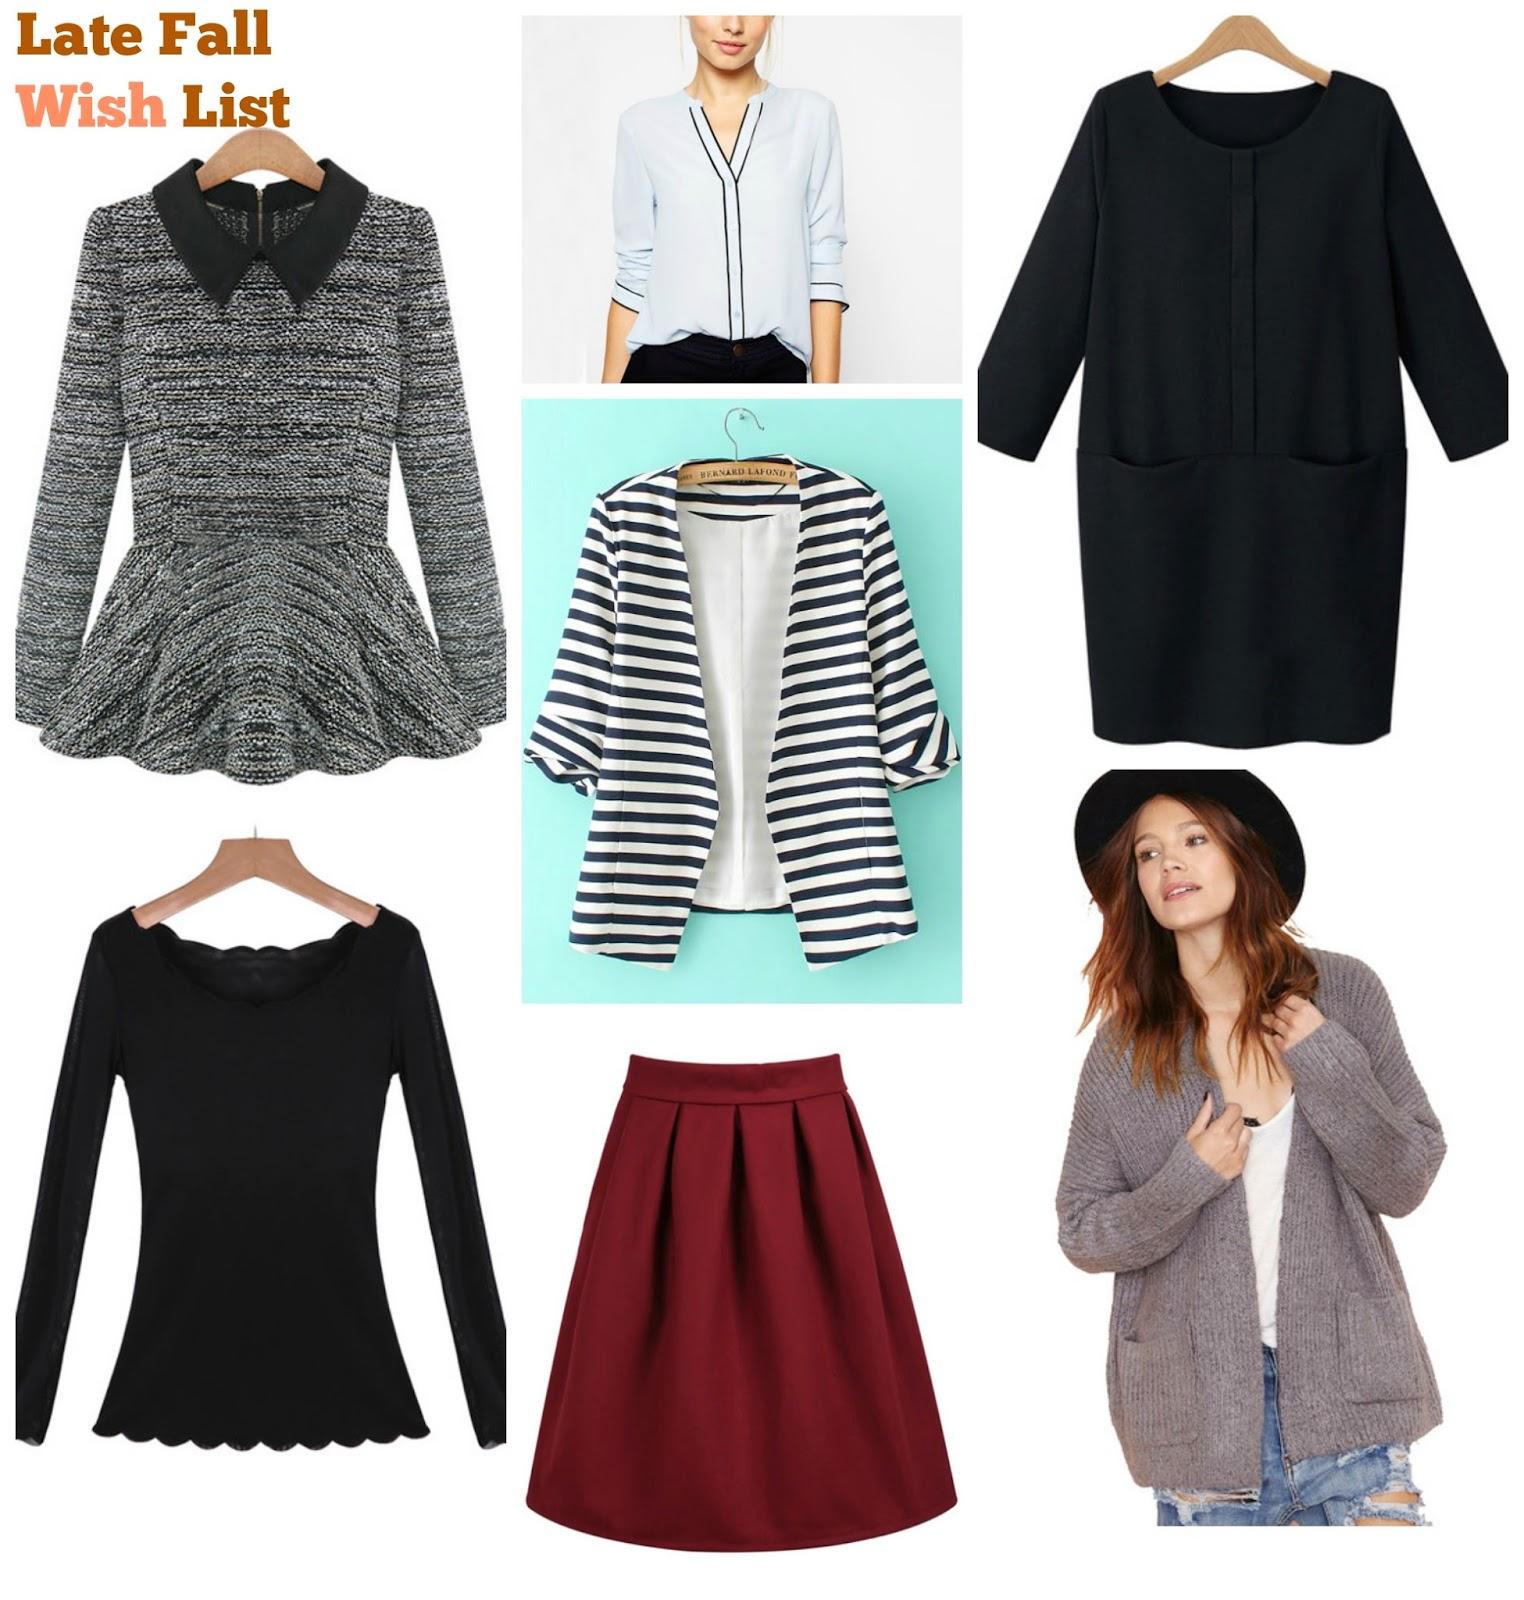 Peplum Sweater, Black Shift dress for Inverted triangle, Burgundy Skirt, Cozy Sweater